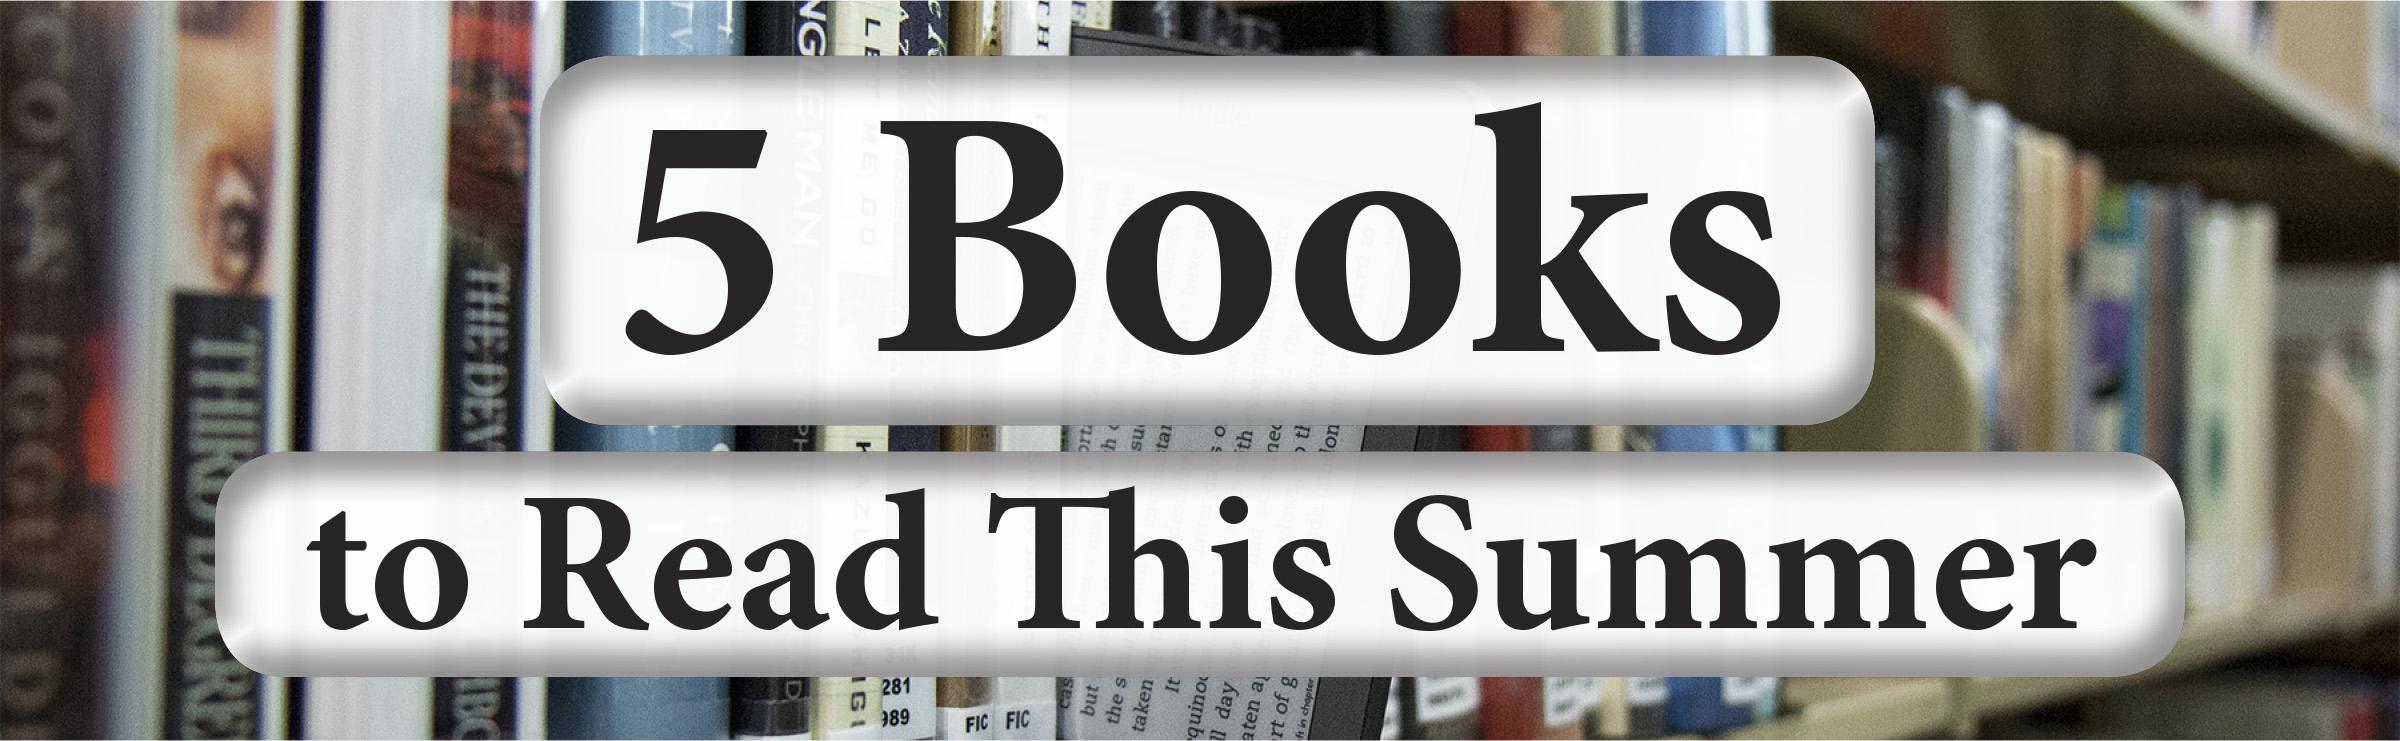 5 books to read this summer jjc joliet junior college